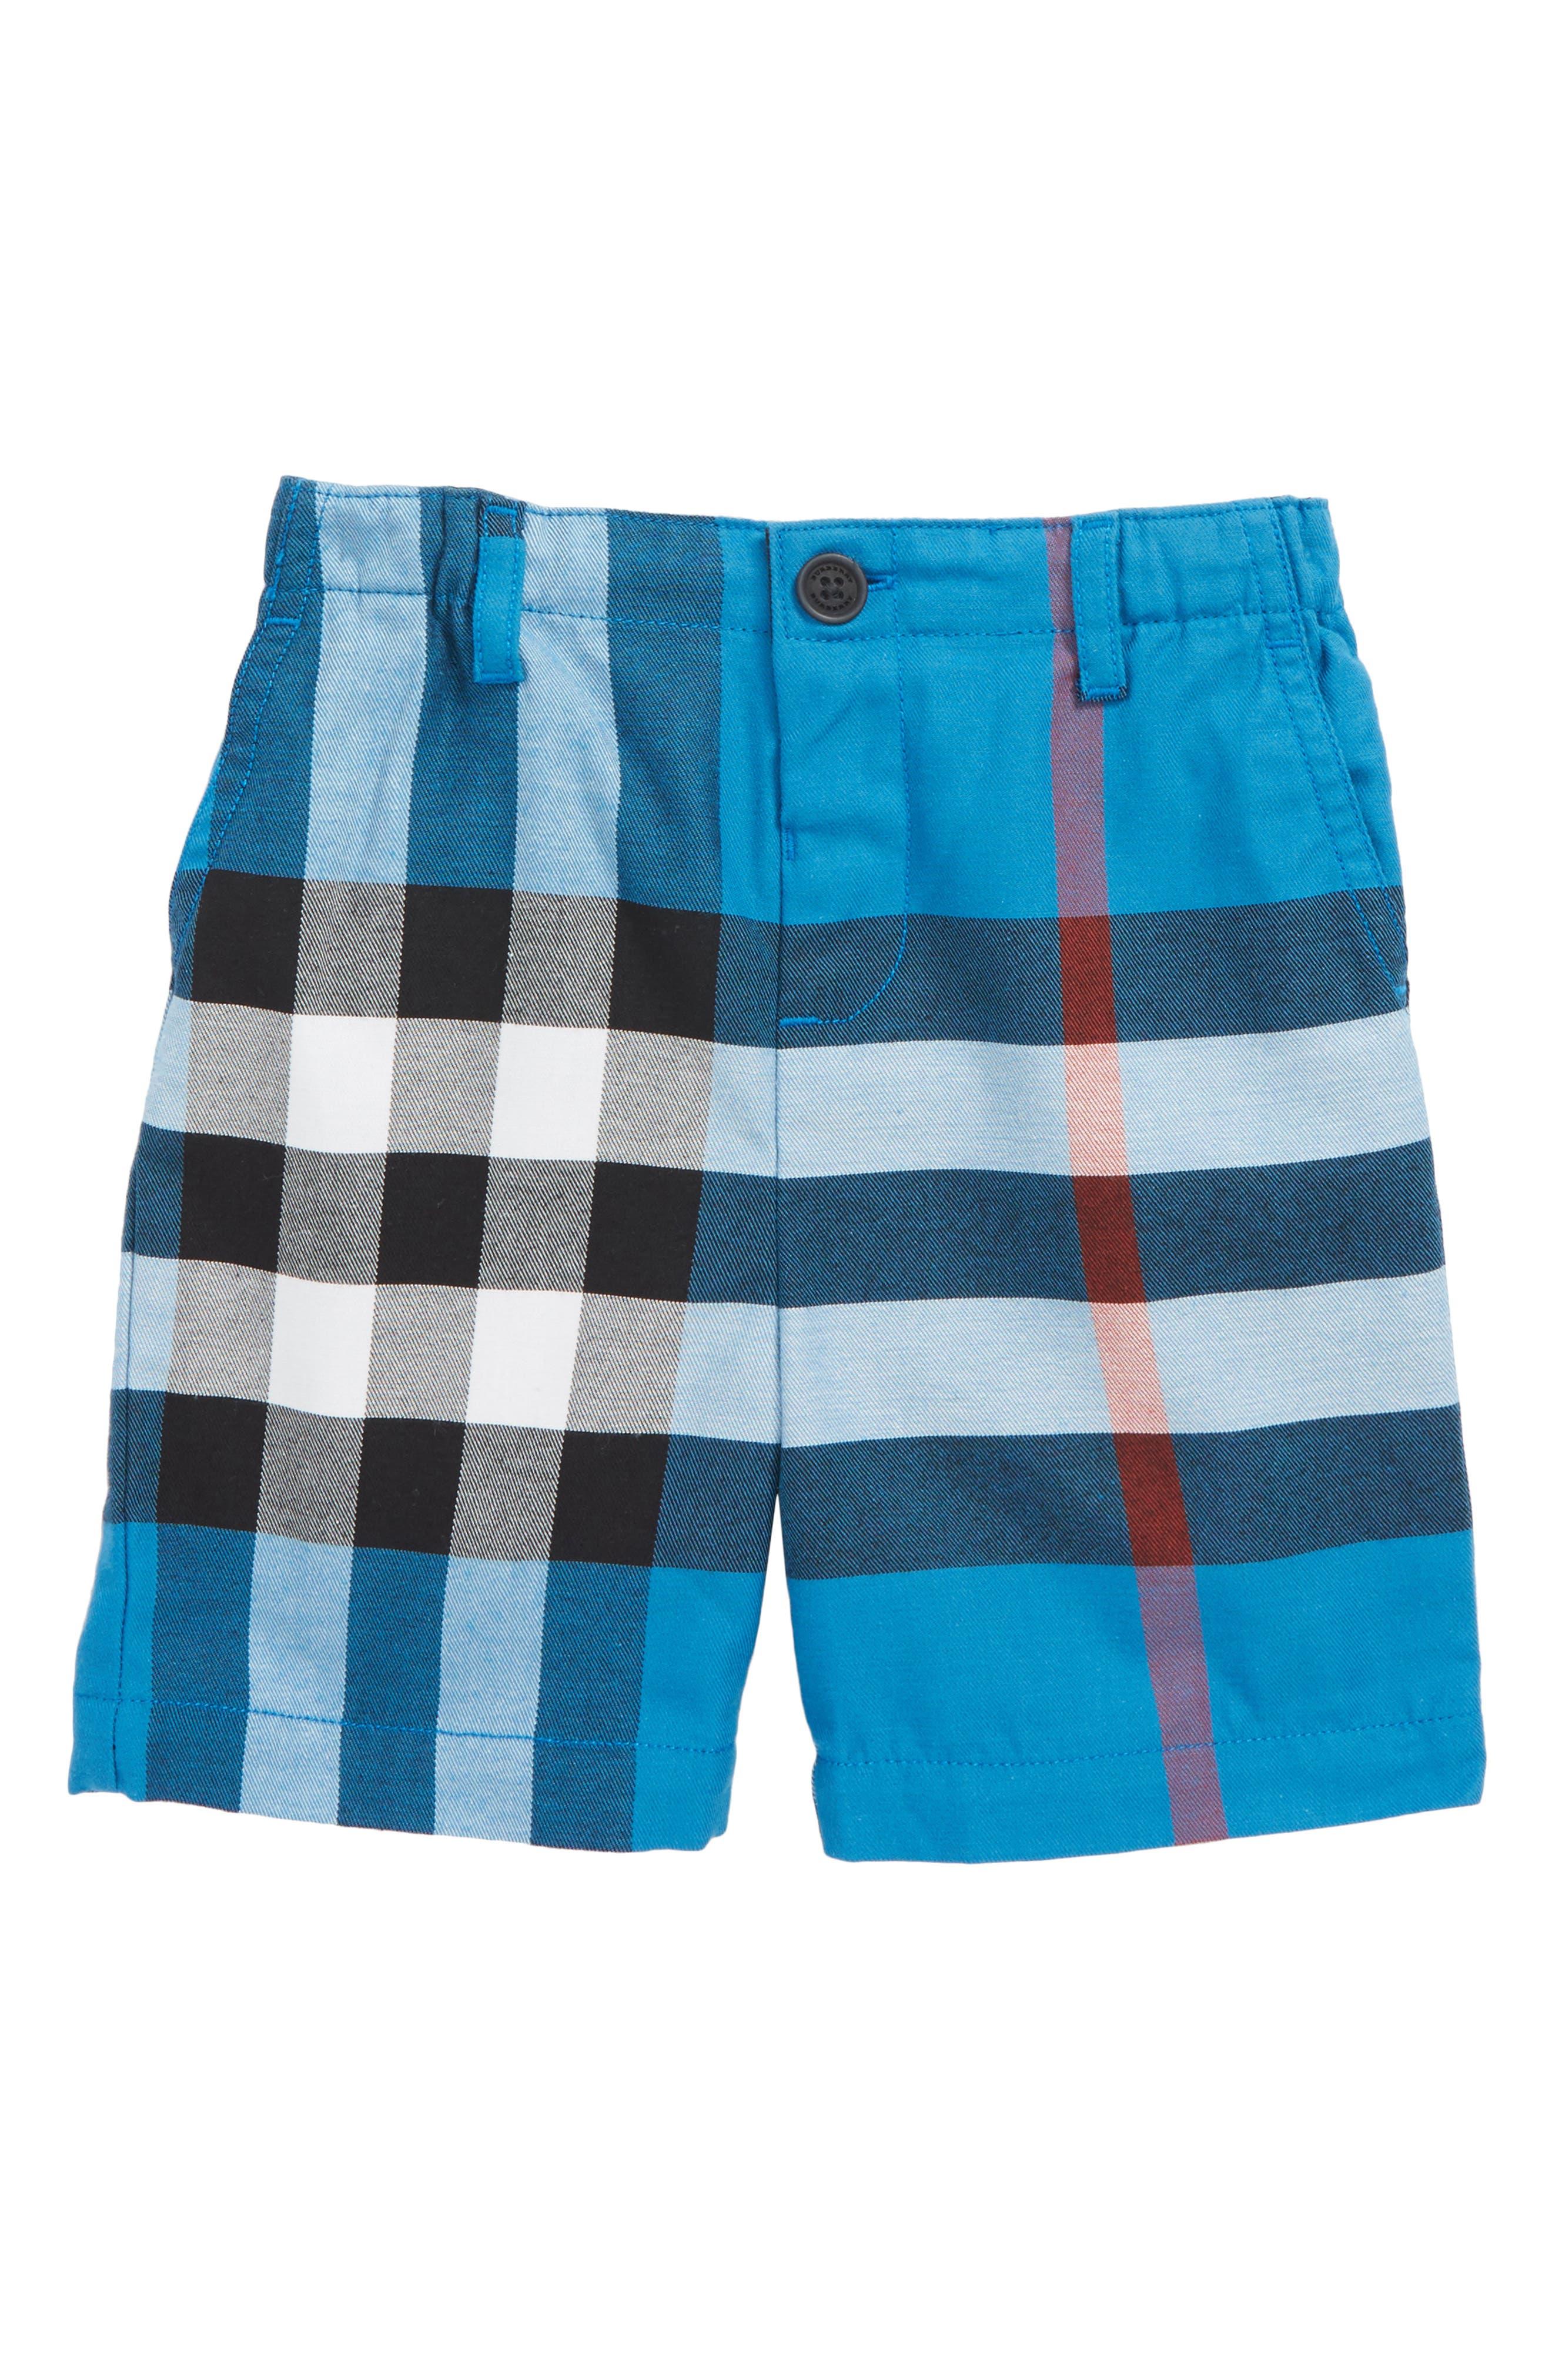 Sean Check Print Shorts,                         Main,                         color, Azure Blue